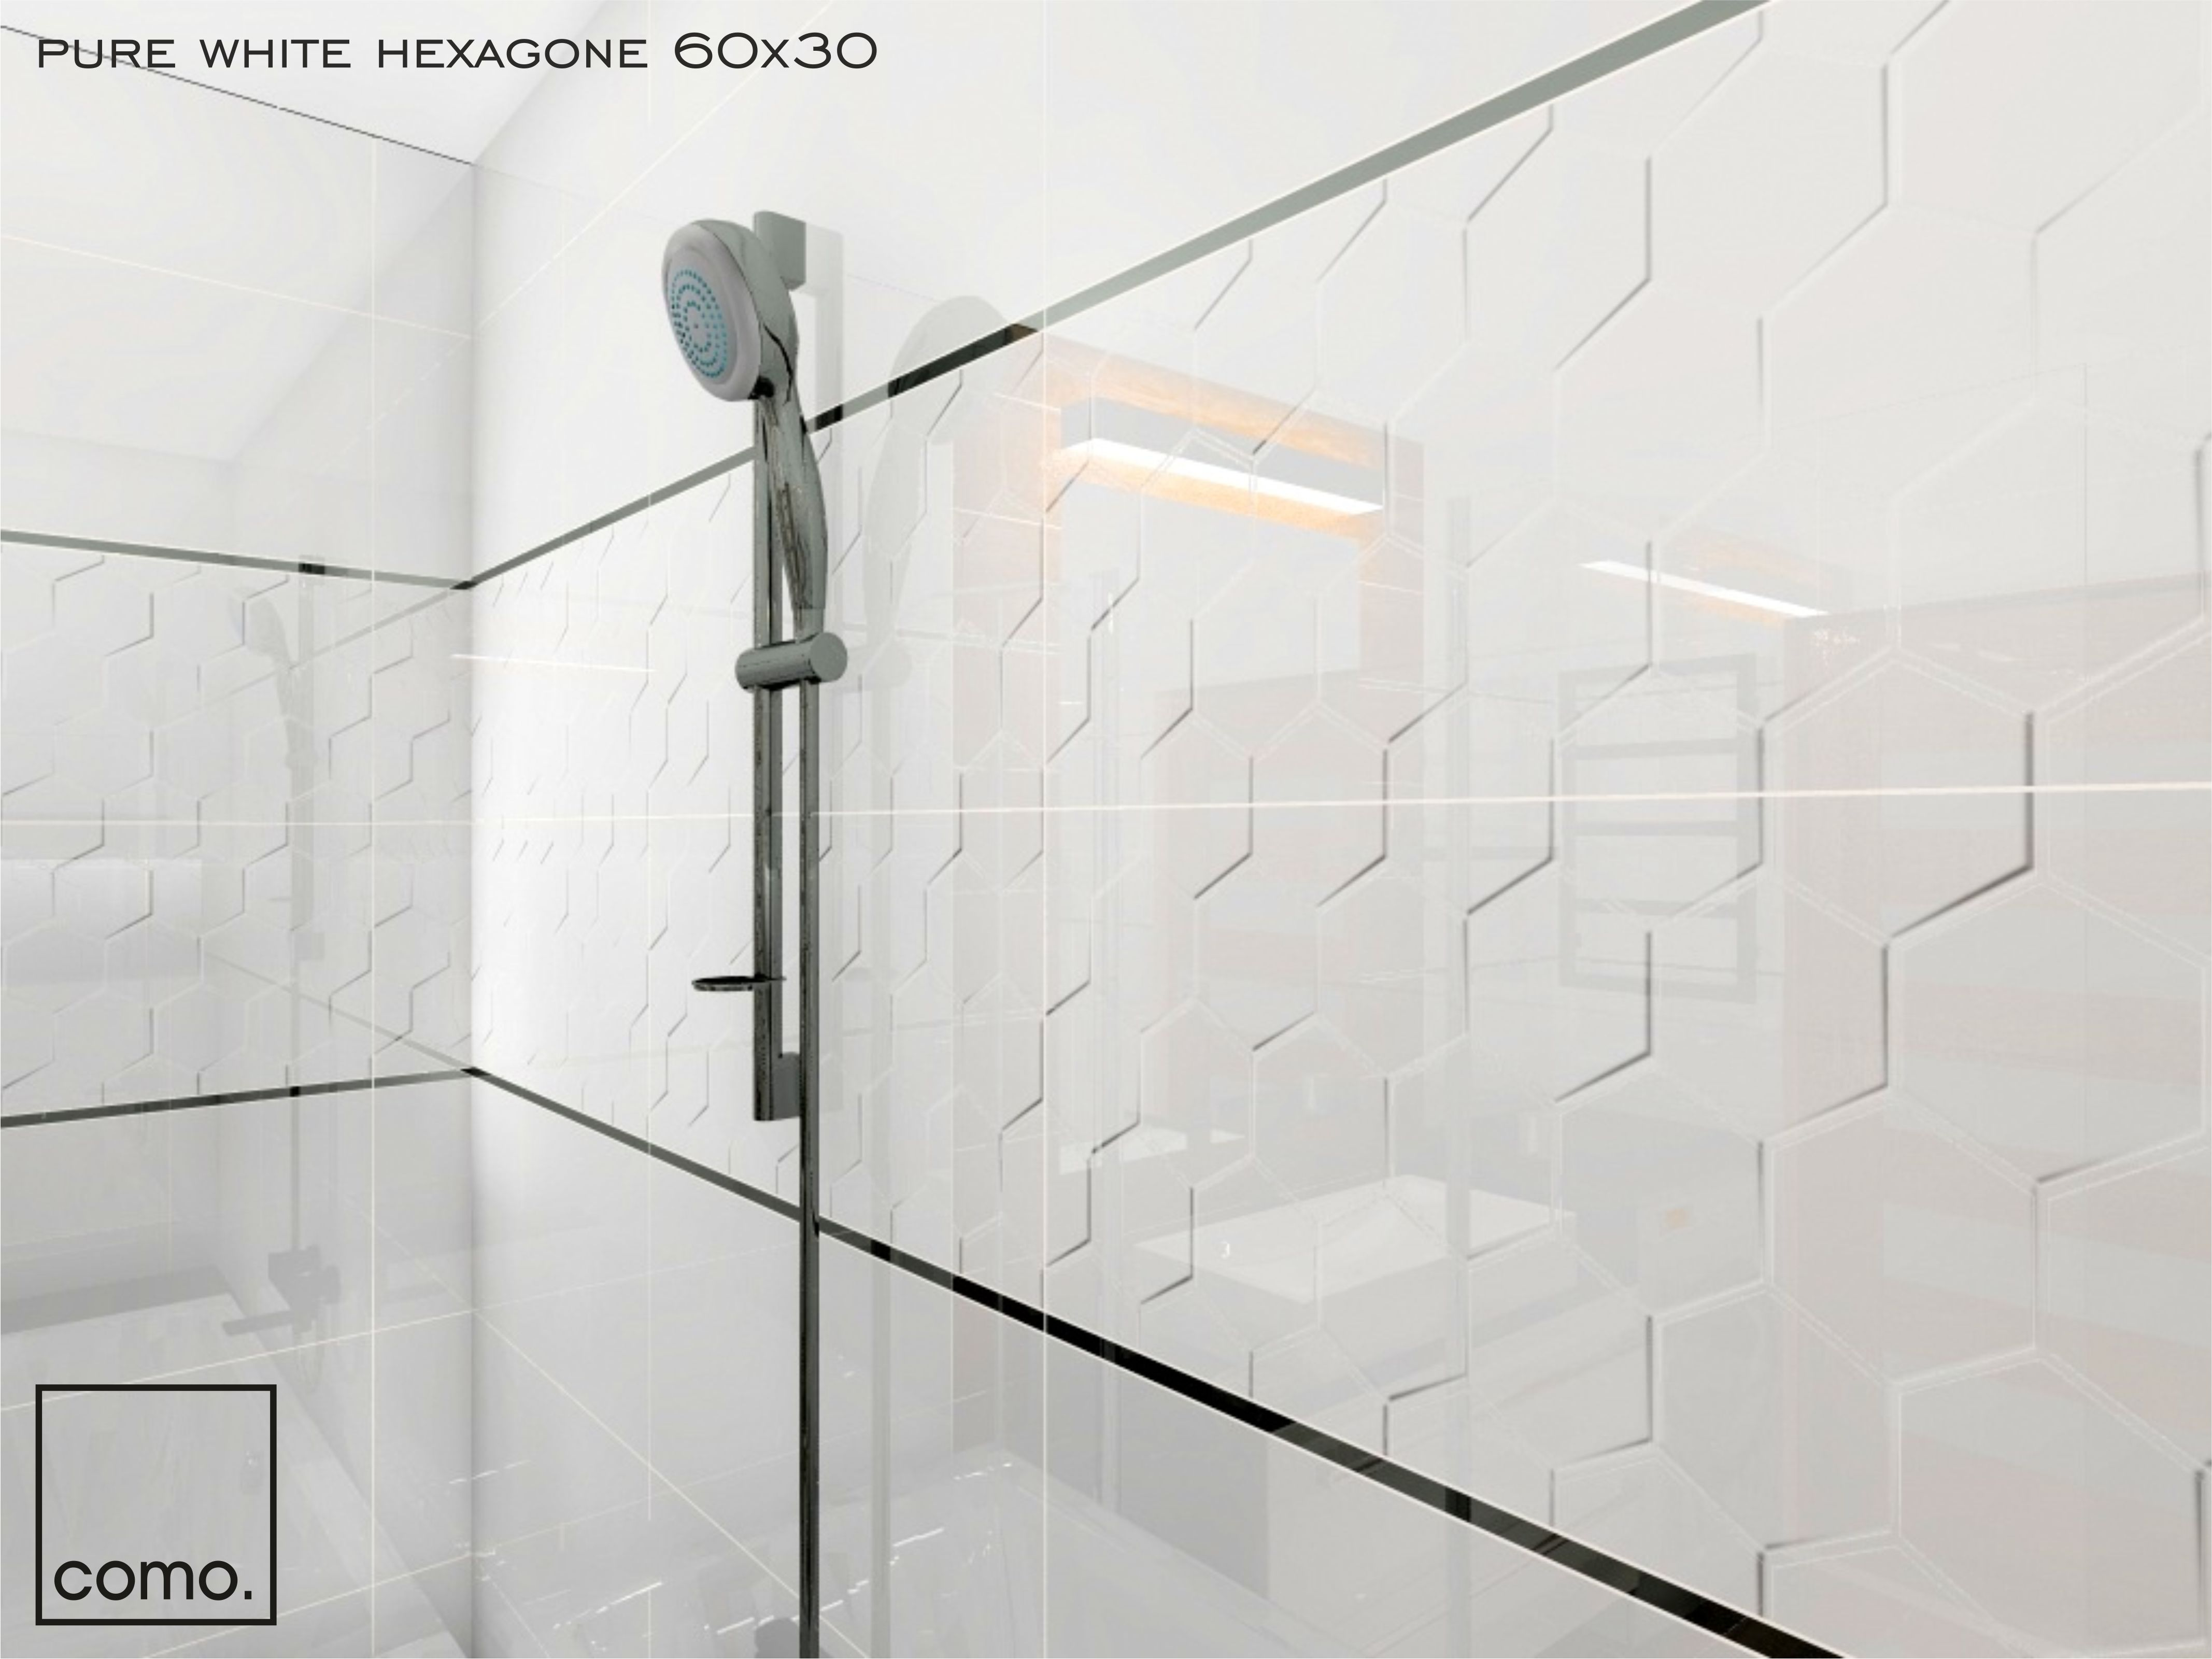 Glazura Biała Dekor 3d Struktura 60x30 Hexagone